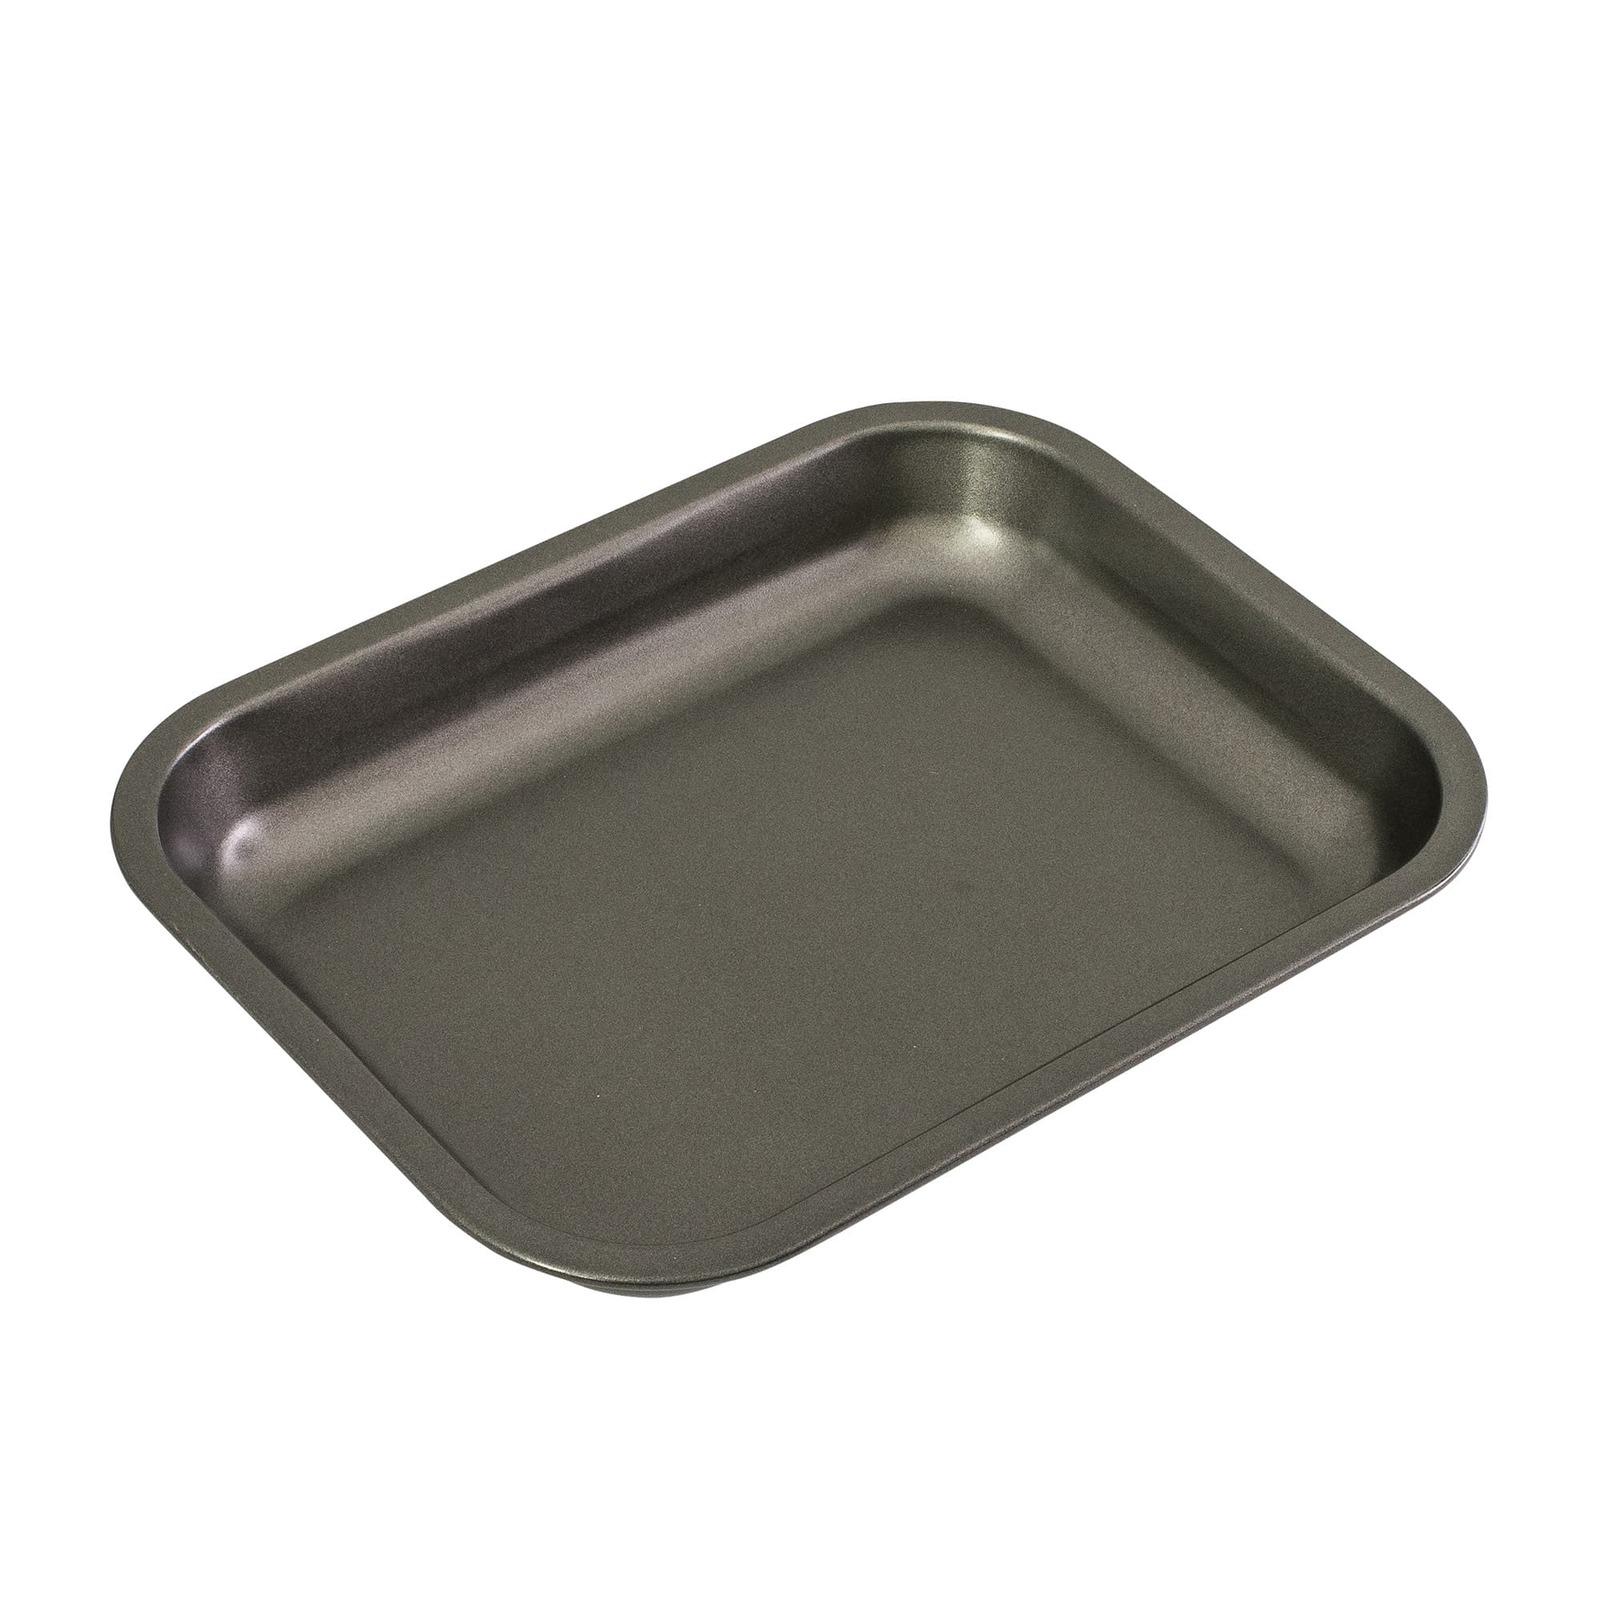 Bakemaster Non Stick Medium Roasting Pan 33x25.5x5cm